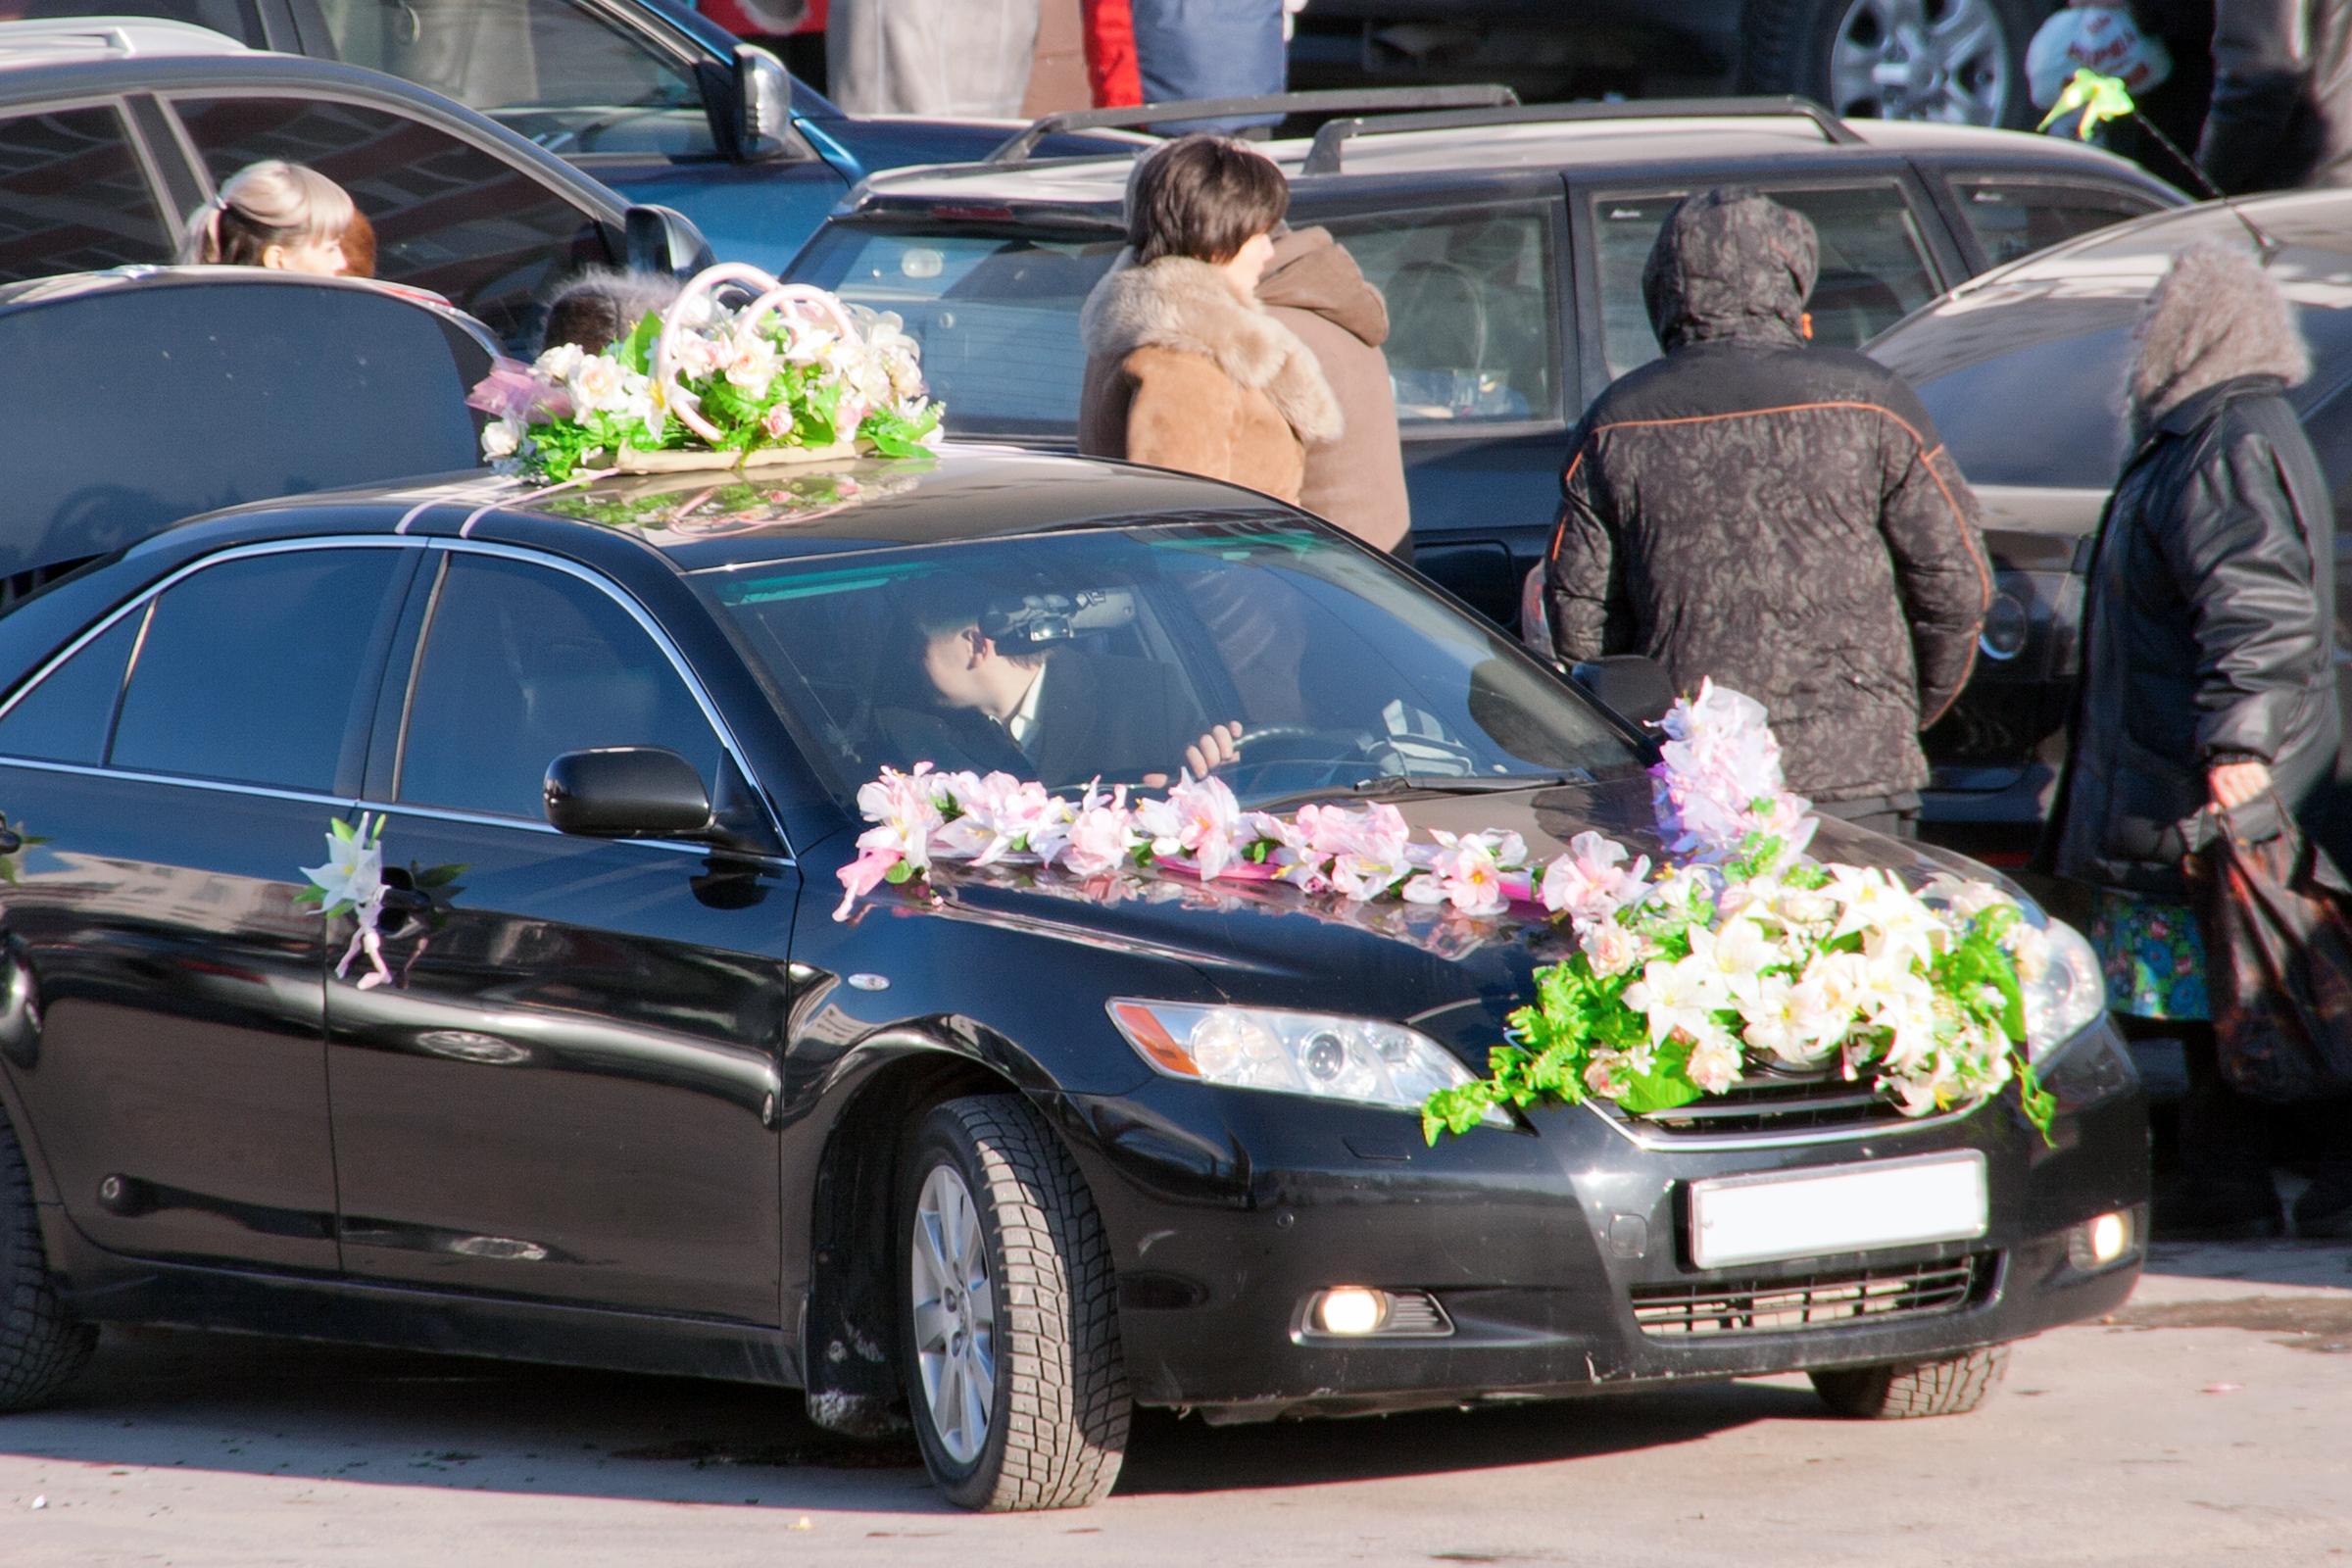 wedding car, Decoration, Ufa, Traditional, Marriage, HQ Photo